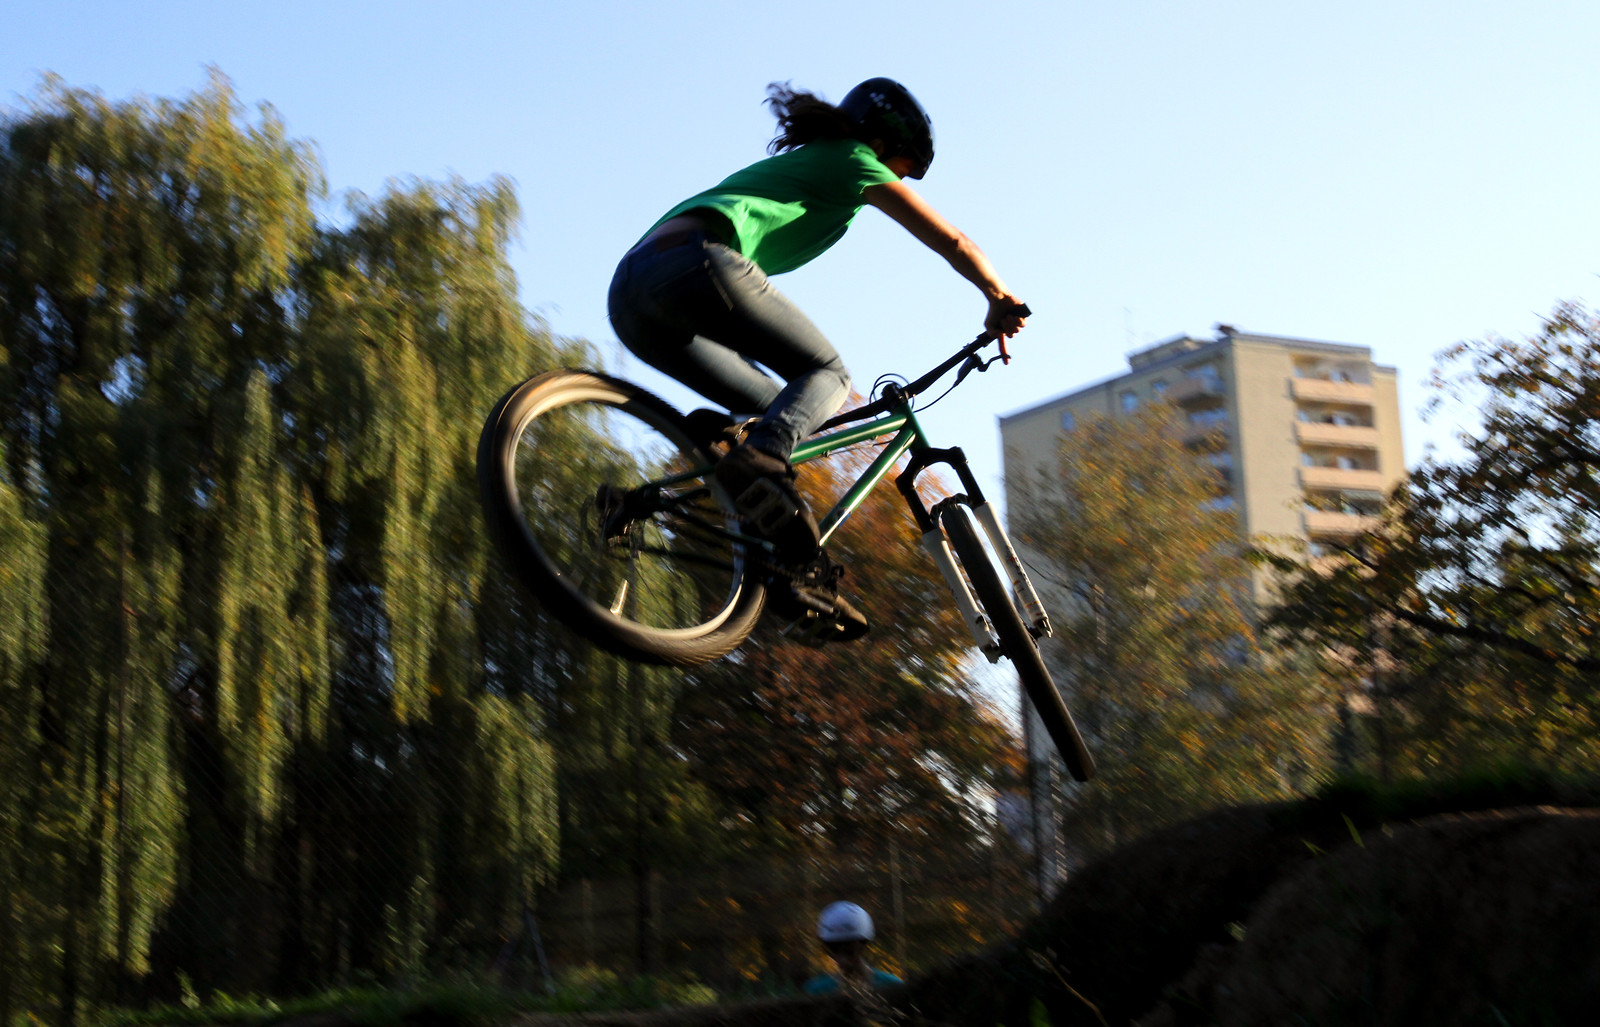 IMG 3724 - The Gap - Mountain Biking Pictures - Vital MTB